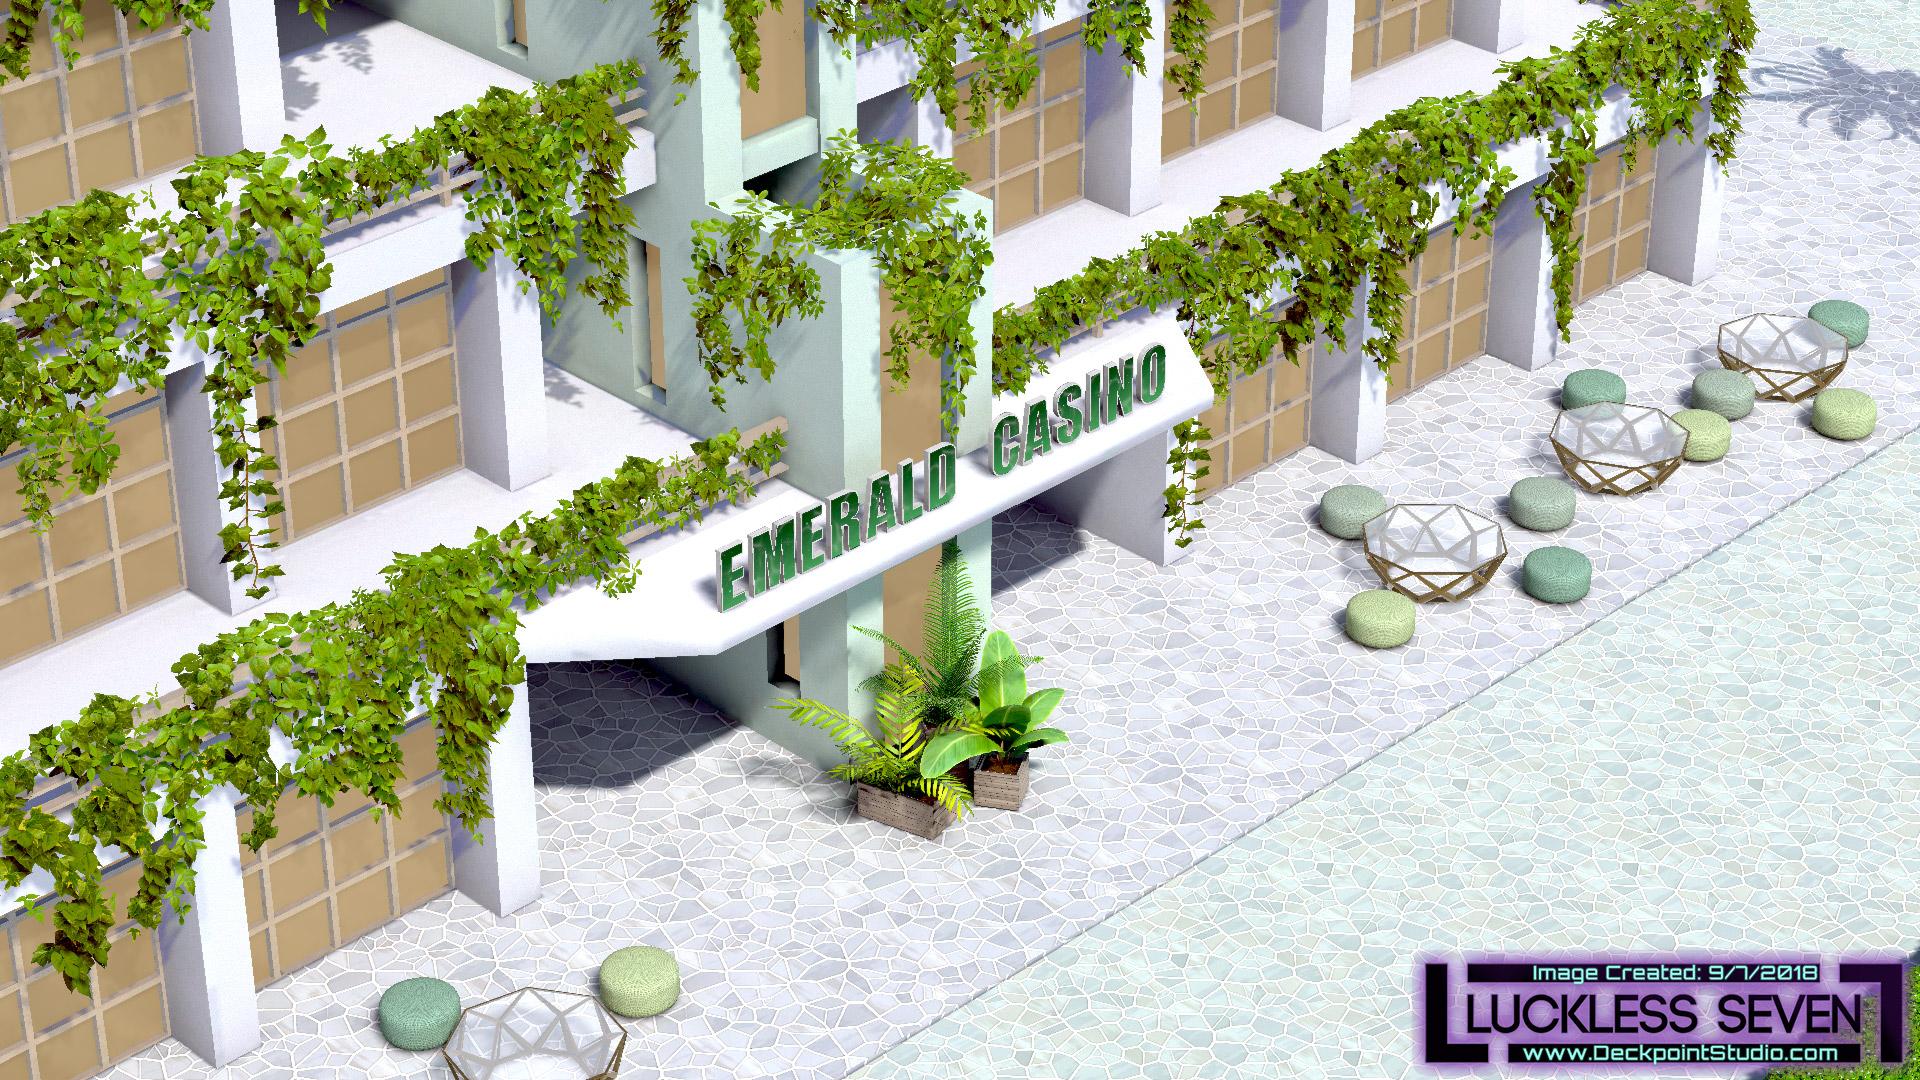 Emerald Casino Luckless Seven 7